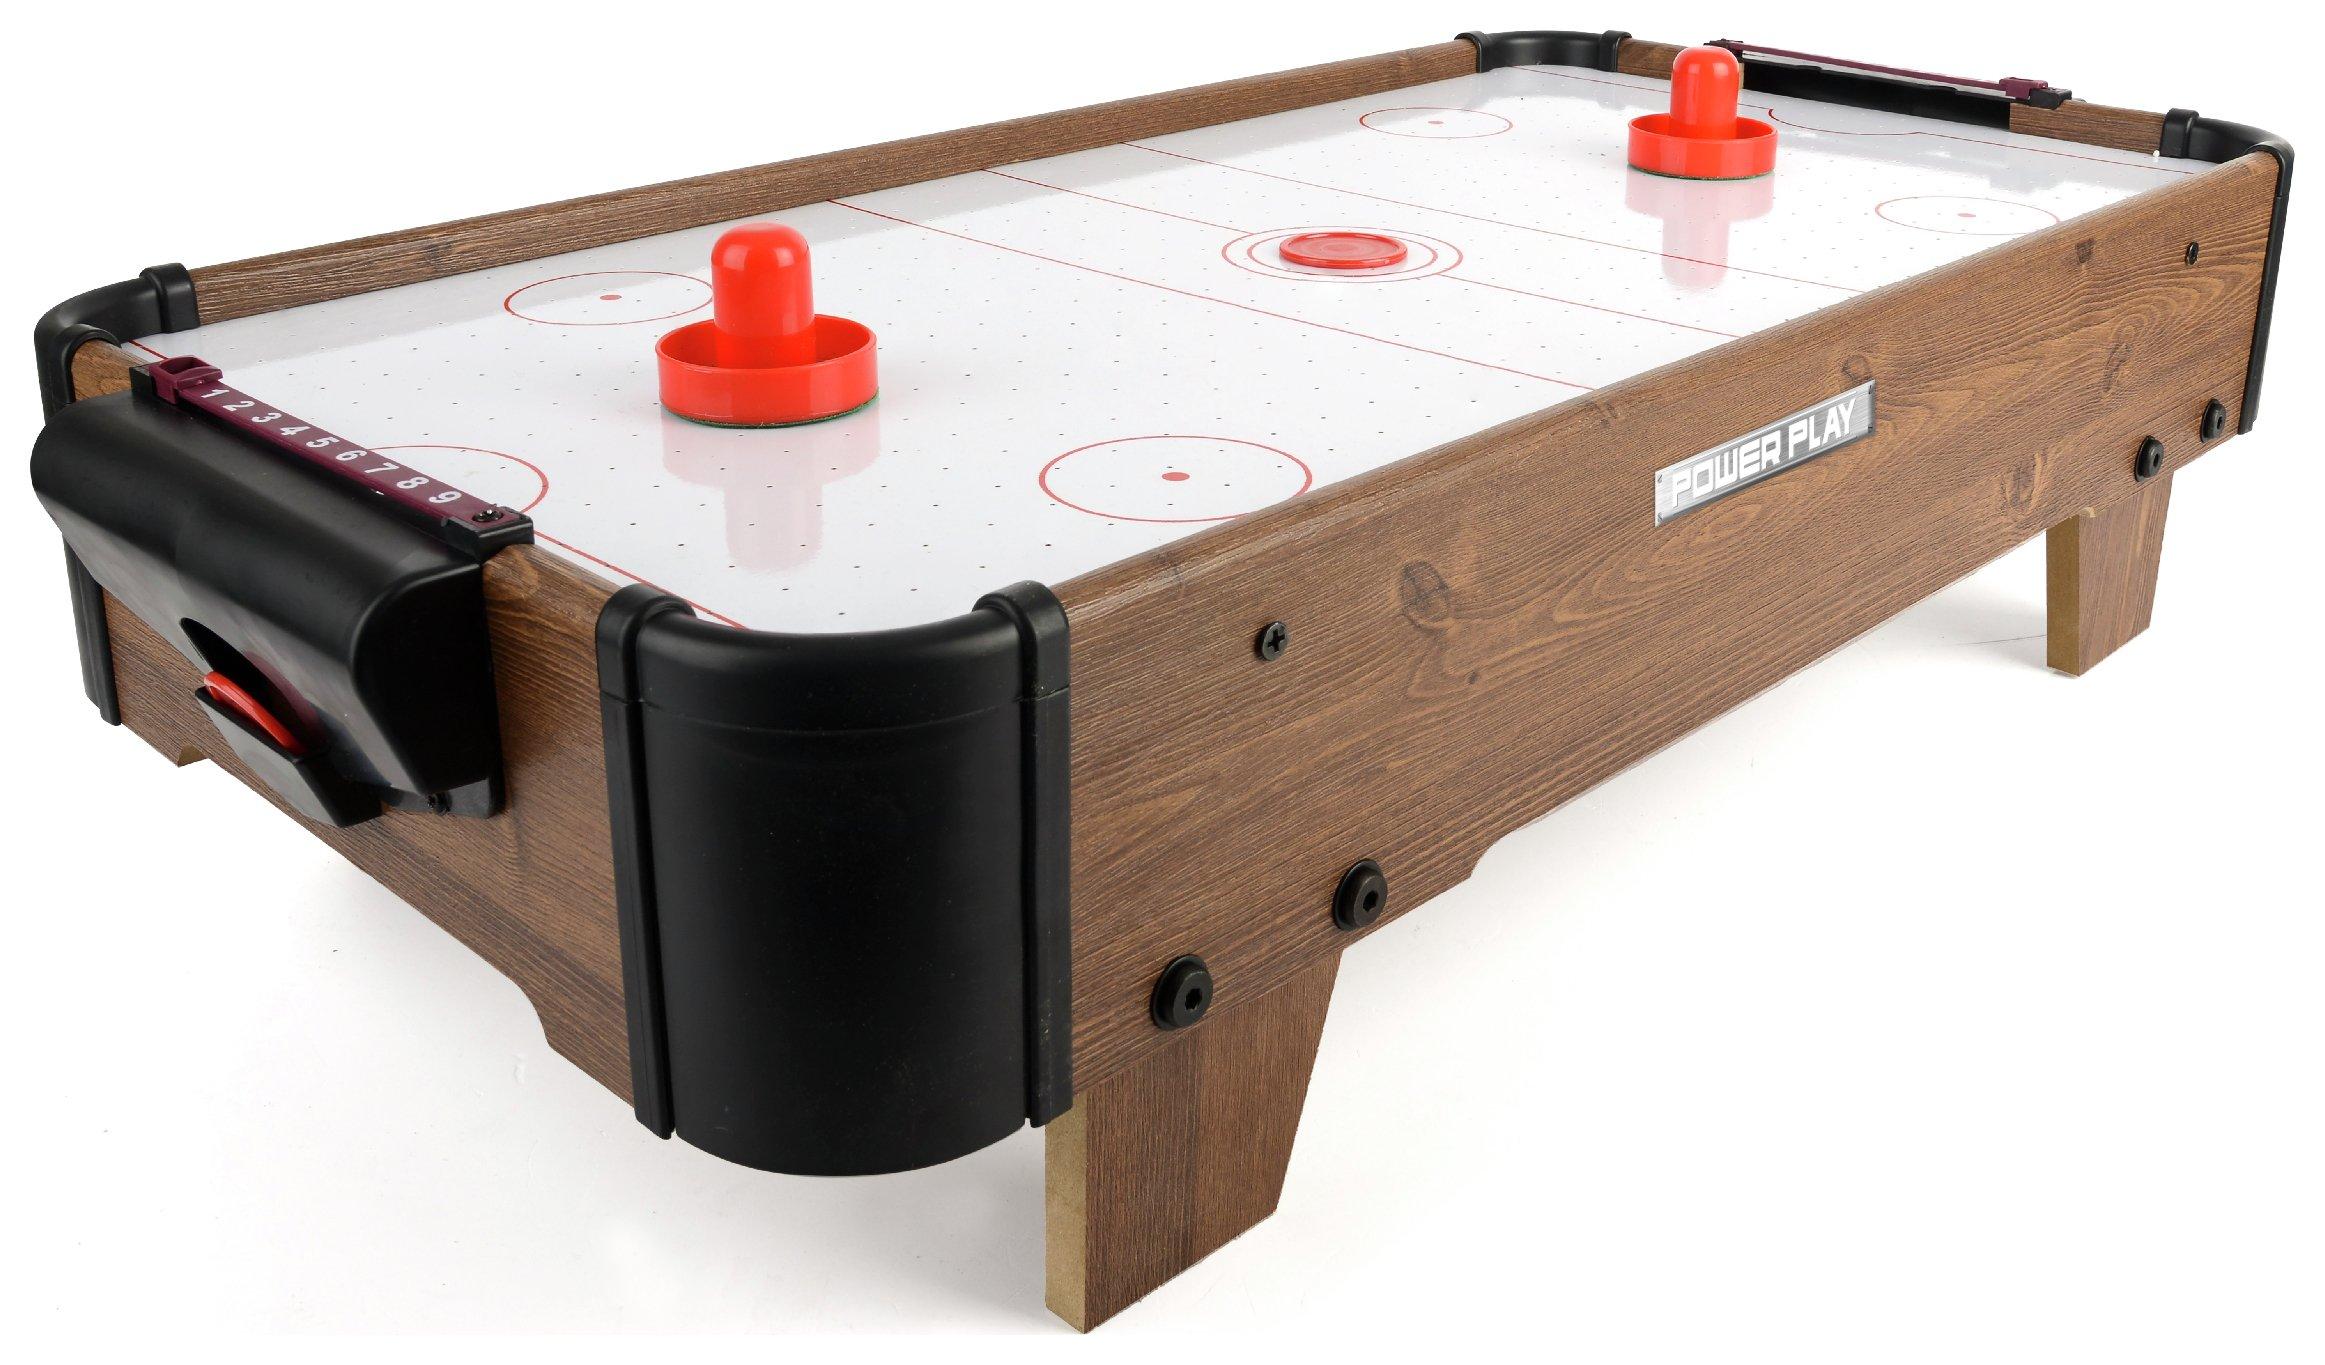 20 Inch Air Hockey Table